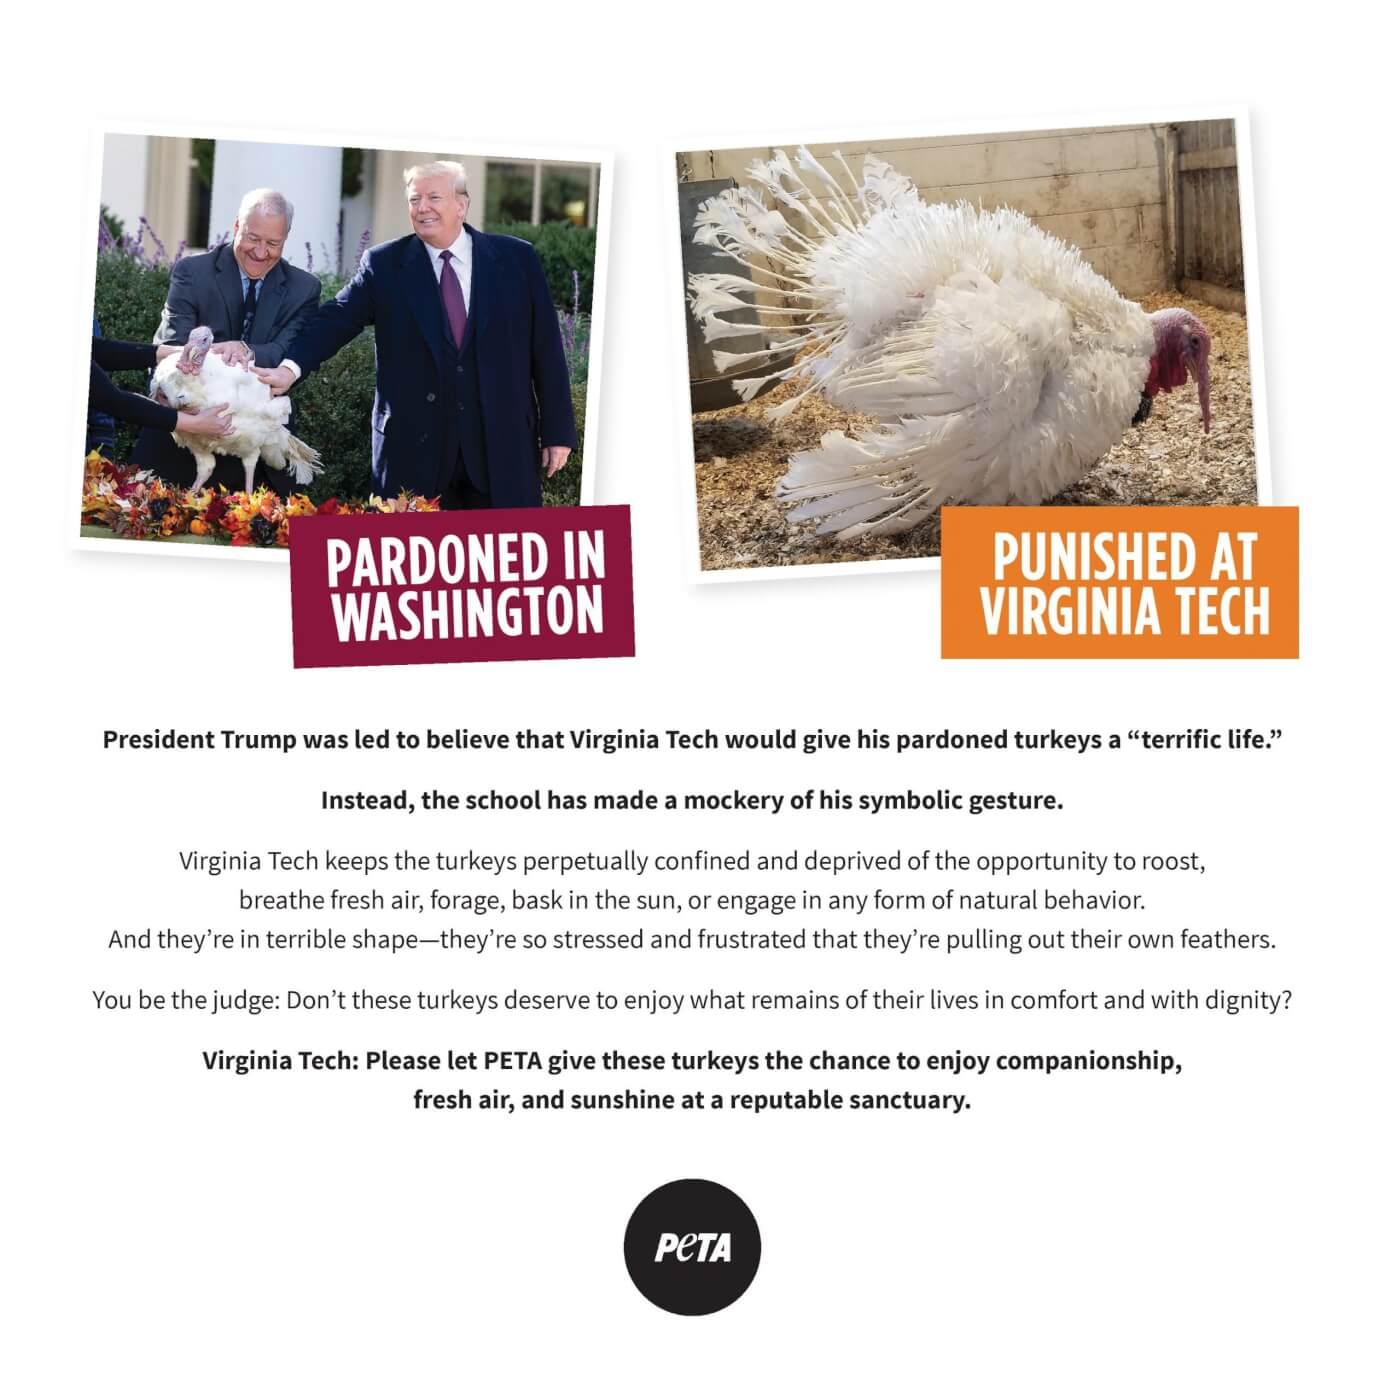 virginia tech pardoned turkeys peta ad